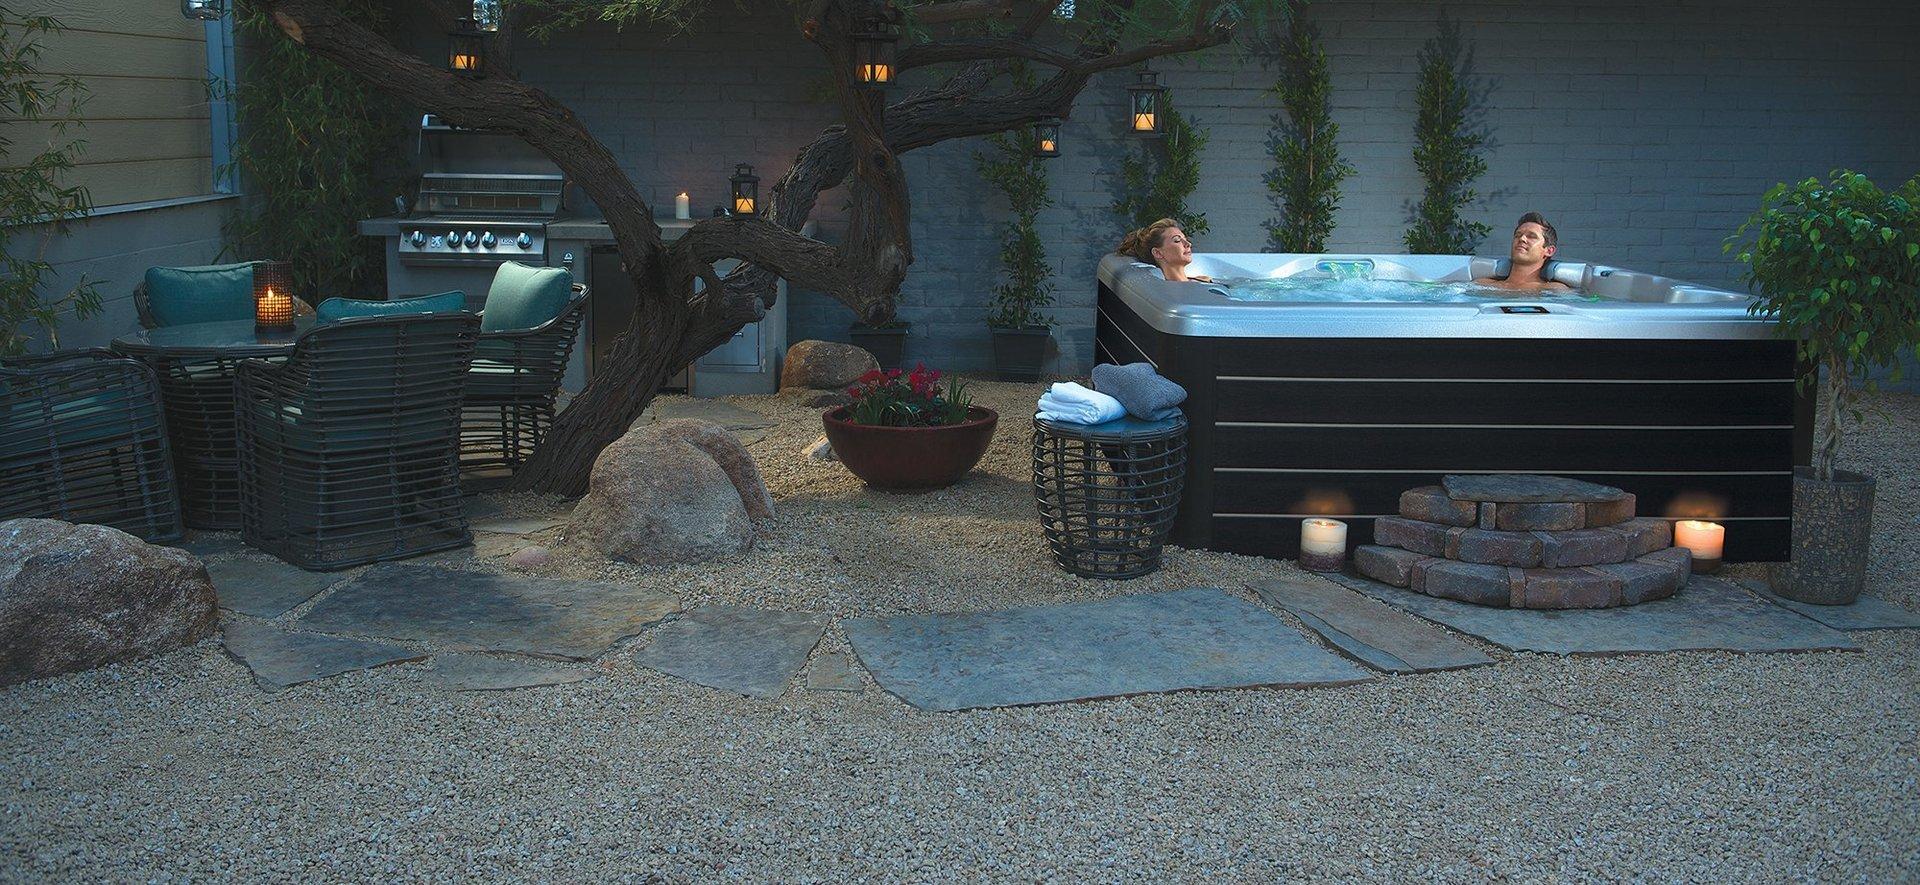 Hot Tubs Buffalo Ny Spa Dealers Majestic Pools